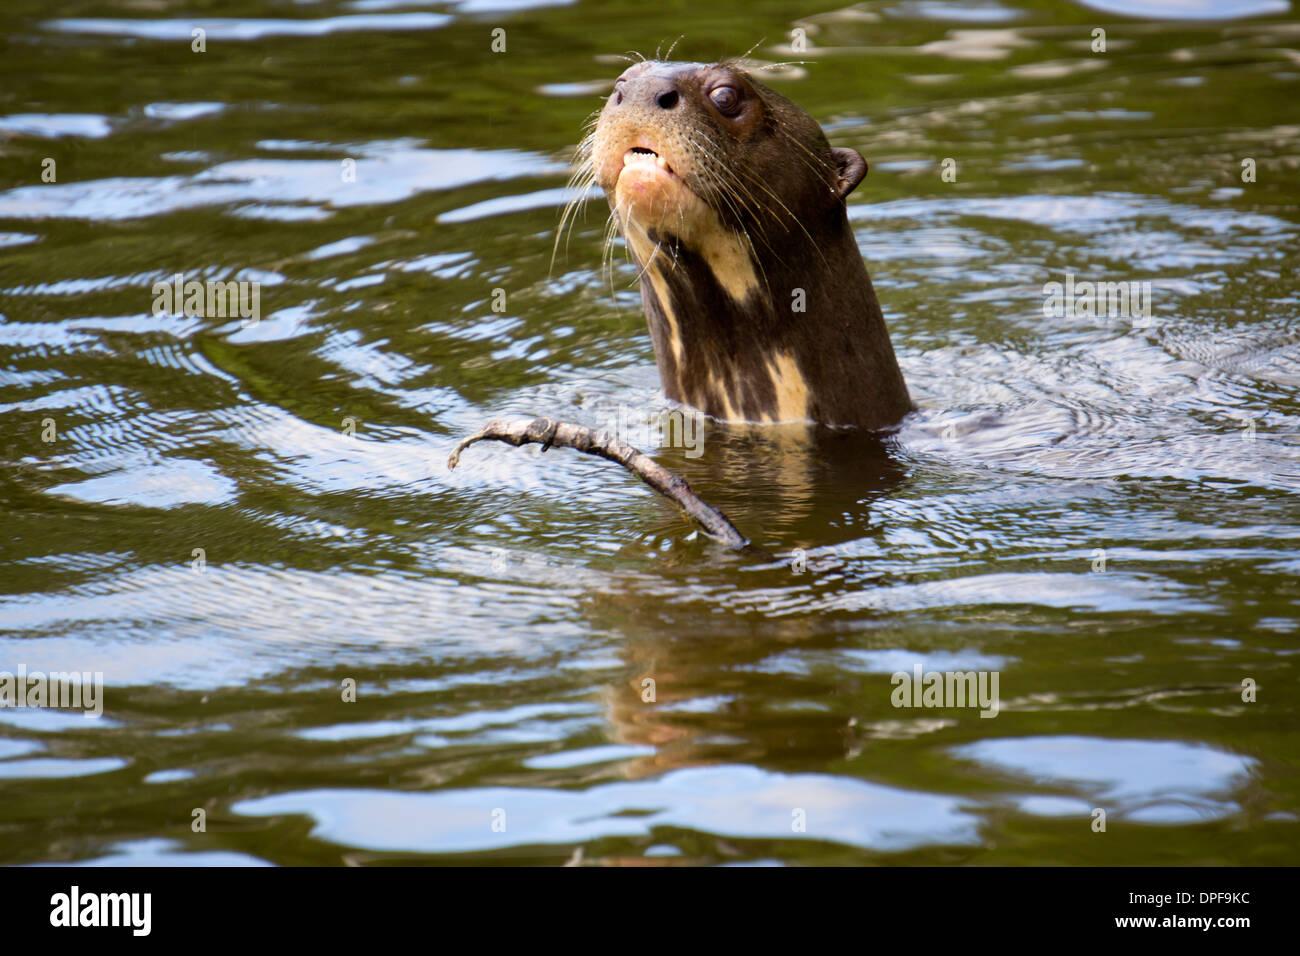 The very rare giant otter, Lake Salvador, Manu National Park, UNESCO World Heritage Site, Peru, South America - Stock Image